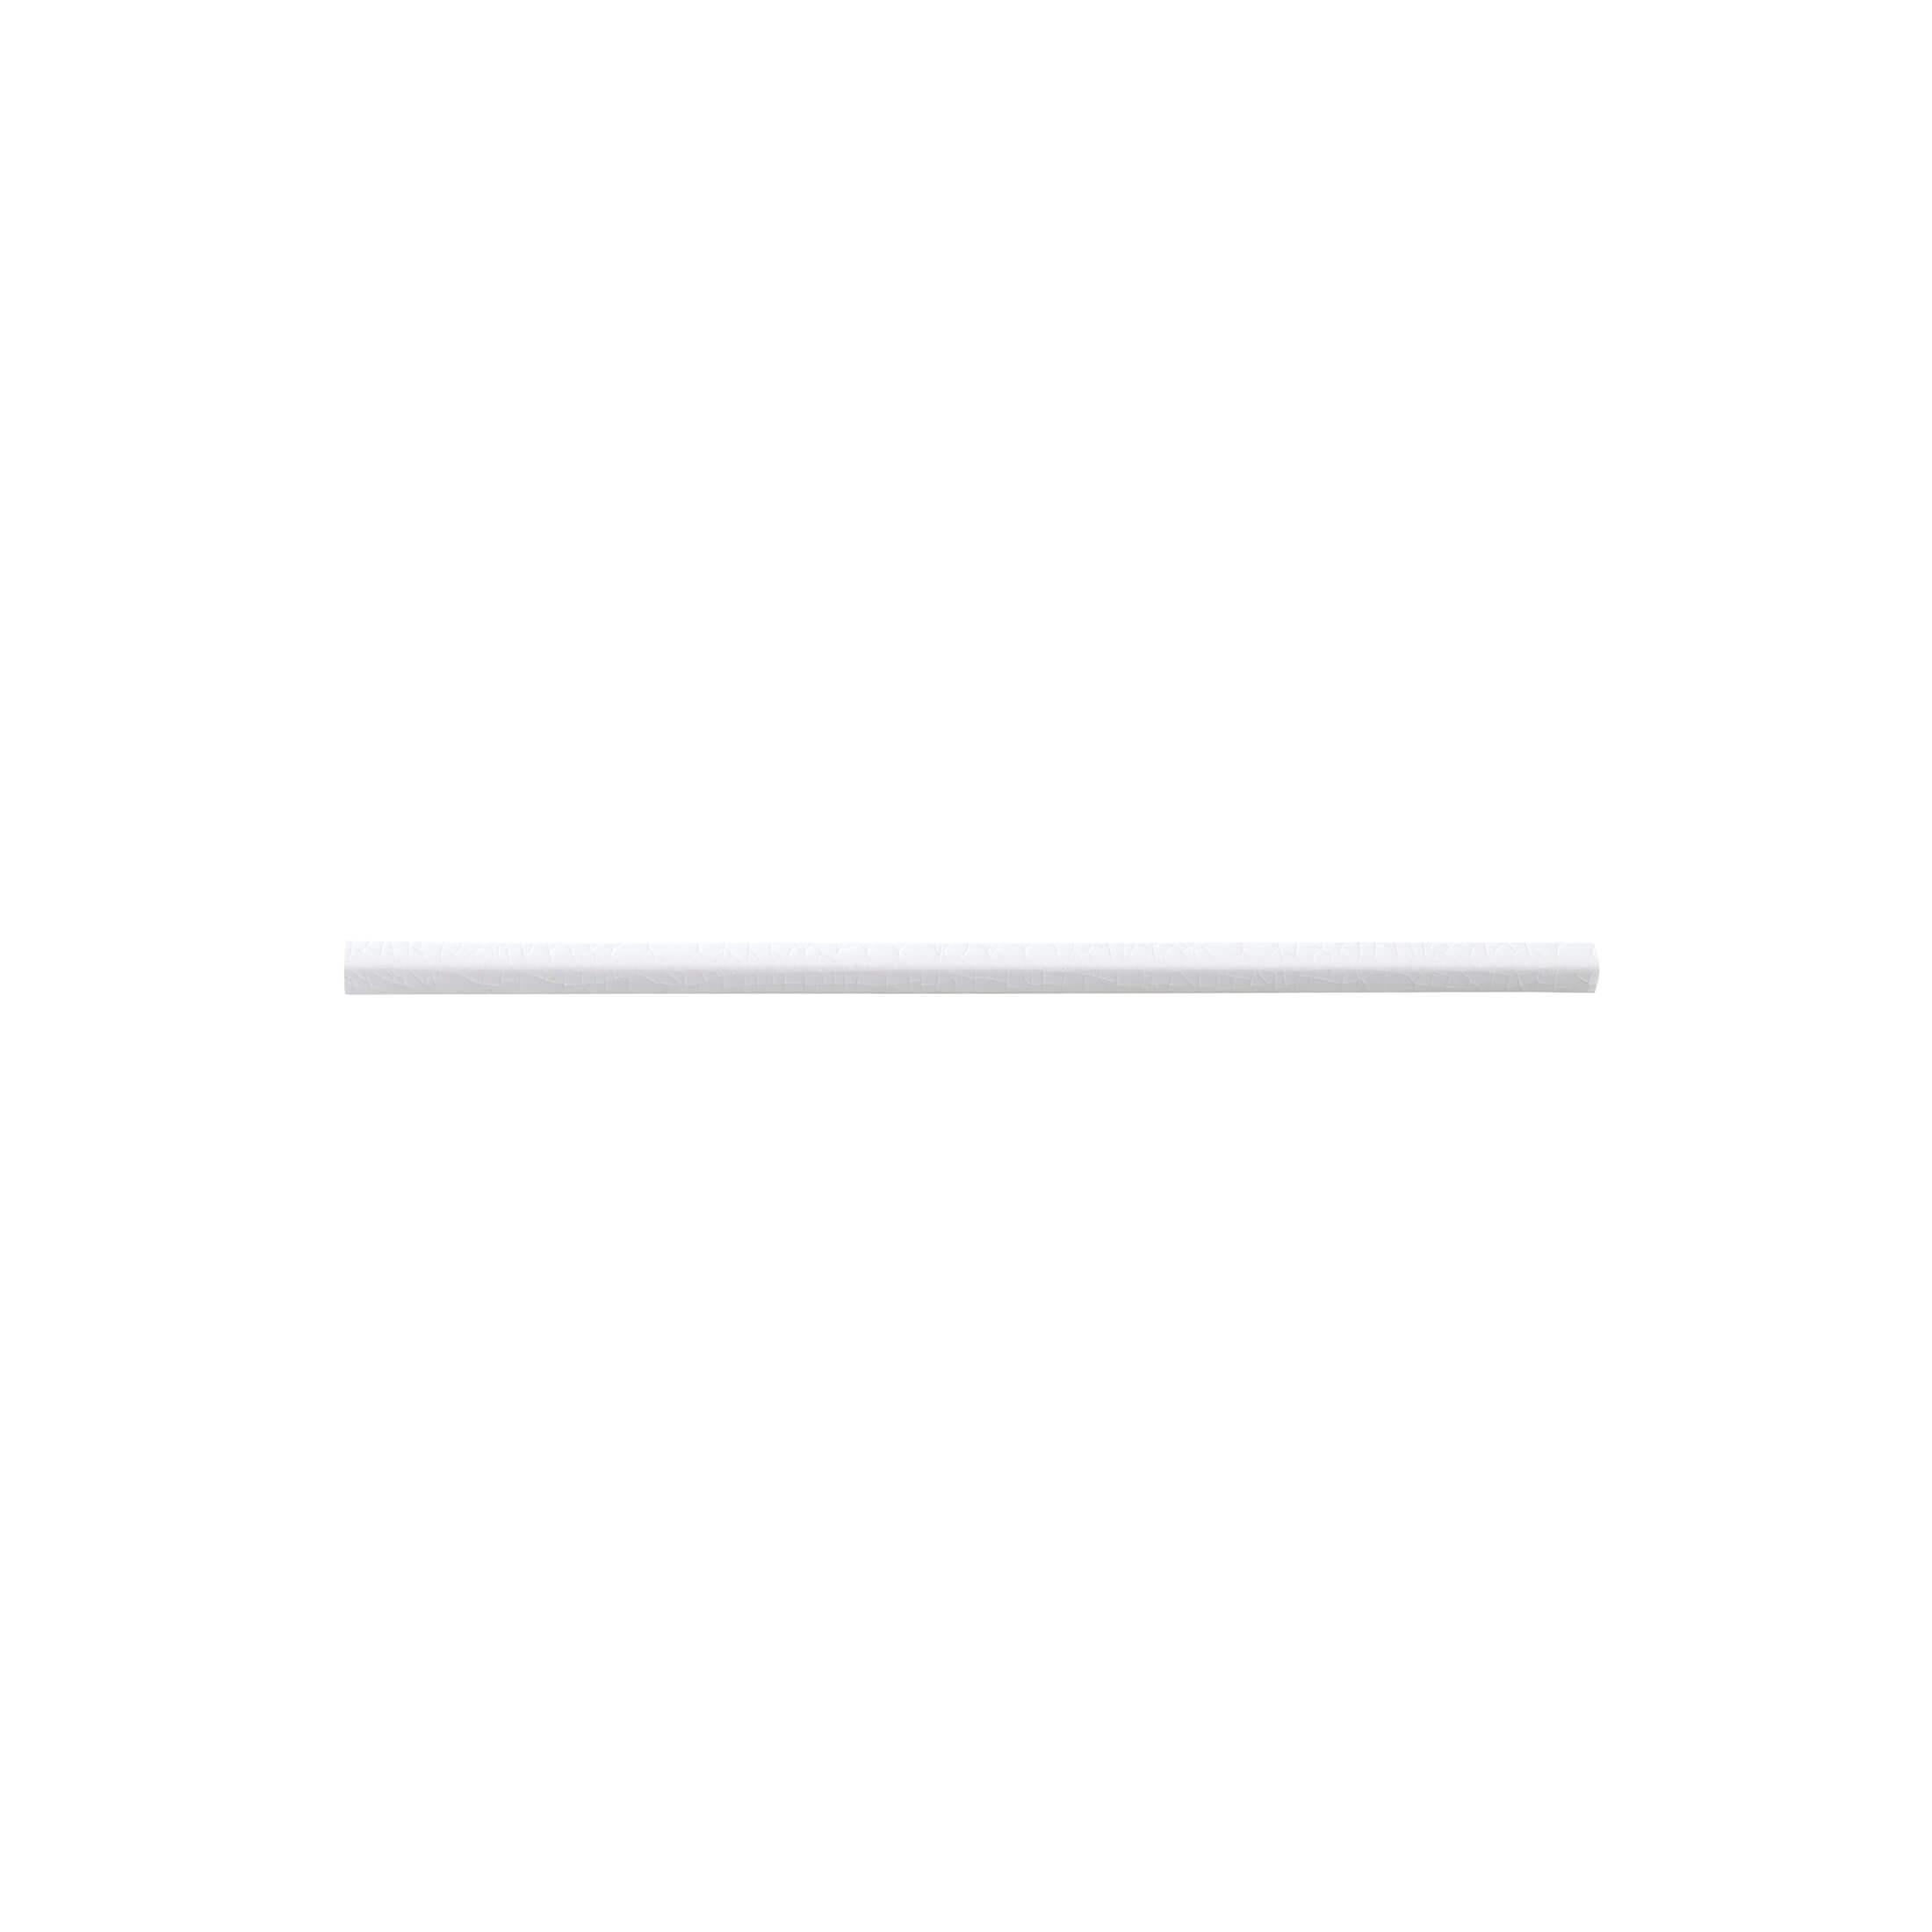 ADNE5575 - BULLNOSE TRIM - 0.85 cm X 20 cm